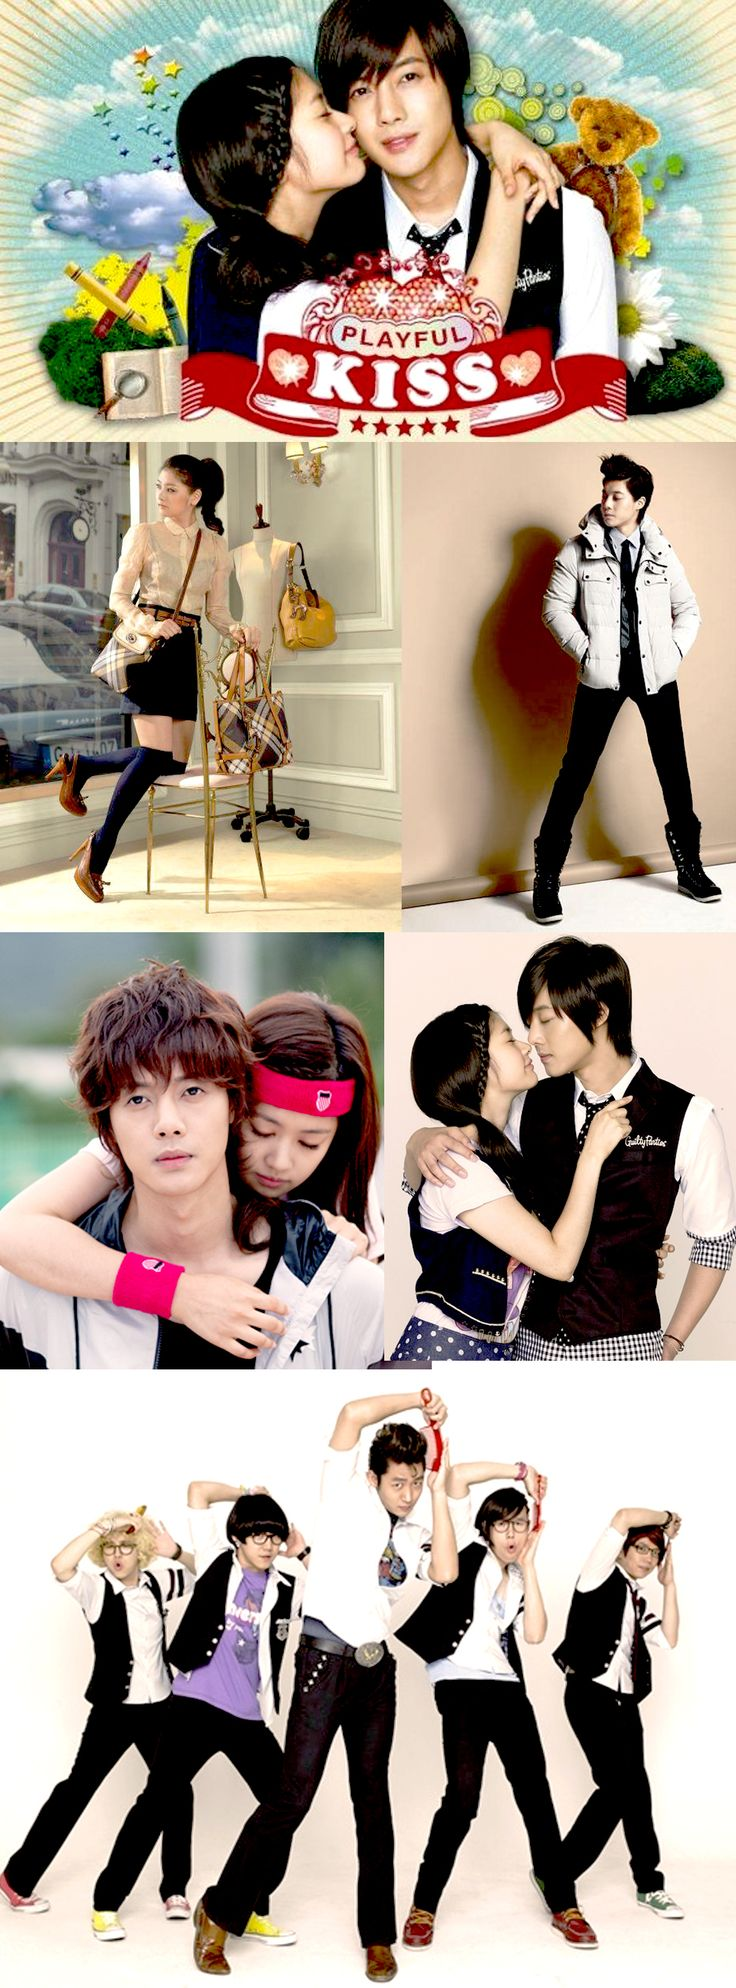 Naughty kiss episode 7 2010 - Playful Kiss Kdrama 2010 16 Episodes Kim Hyun Jung So Lee